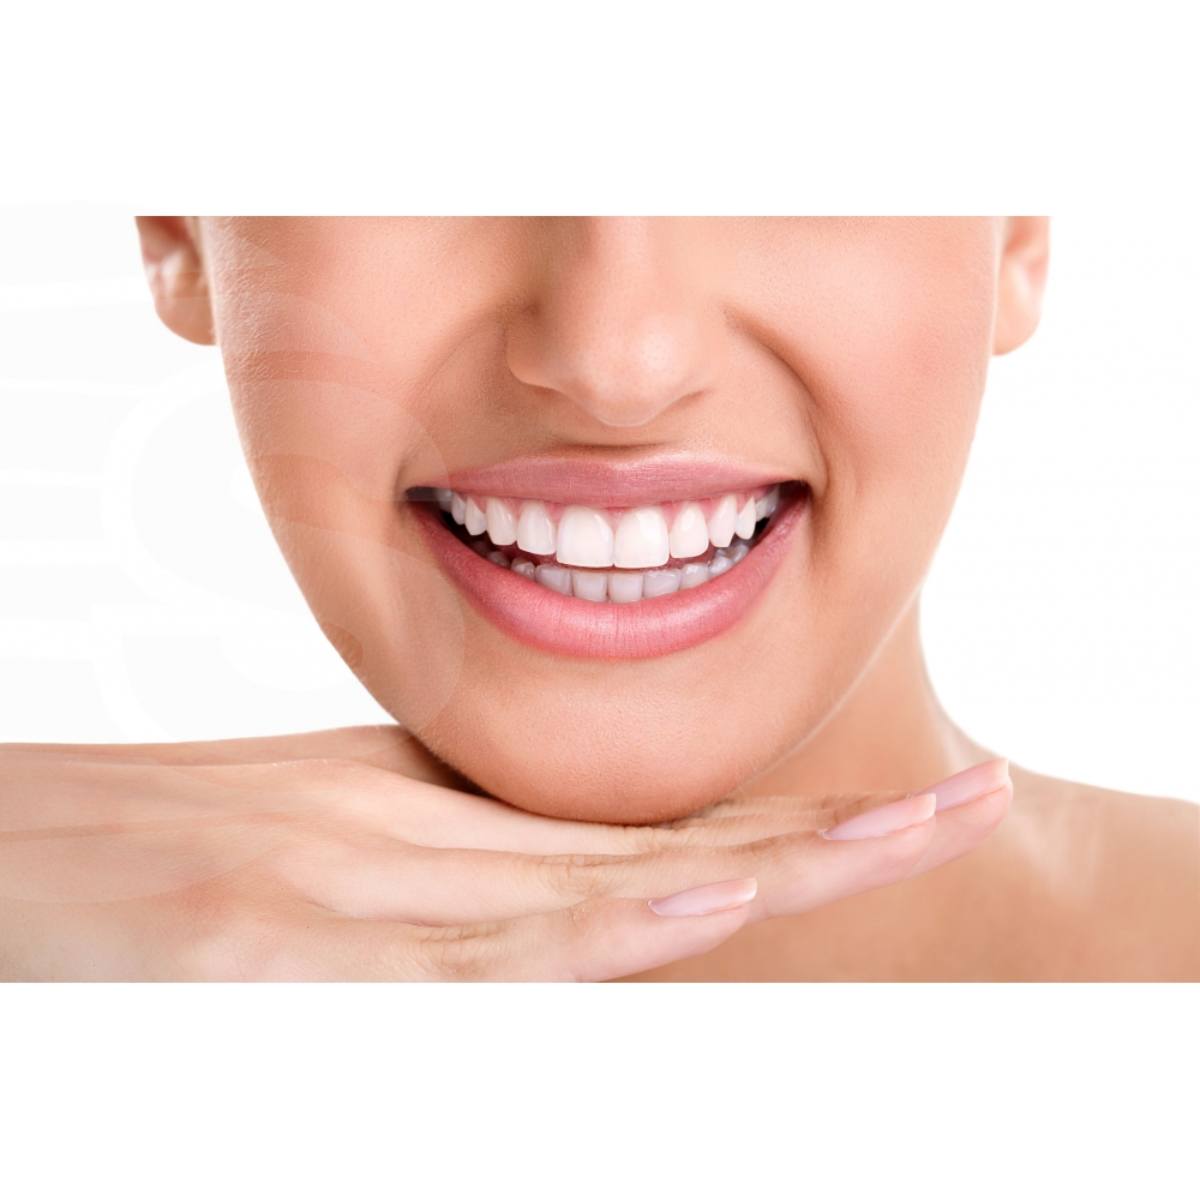 NIGHT, Tiras de clareamento dental estético